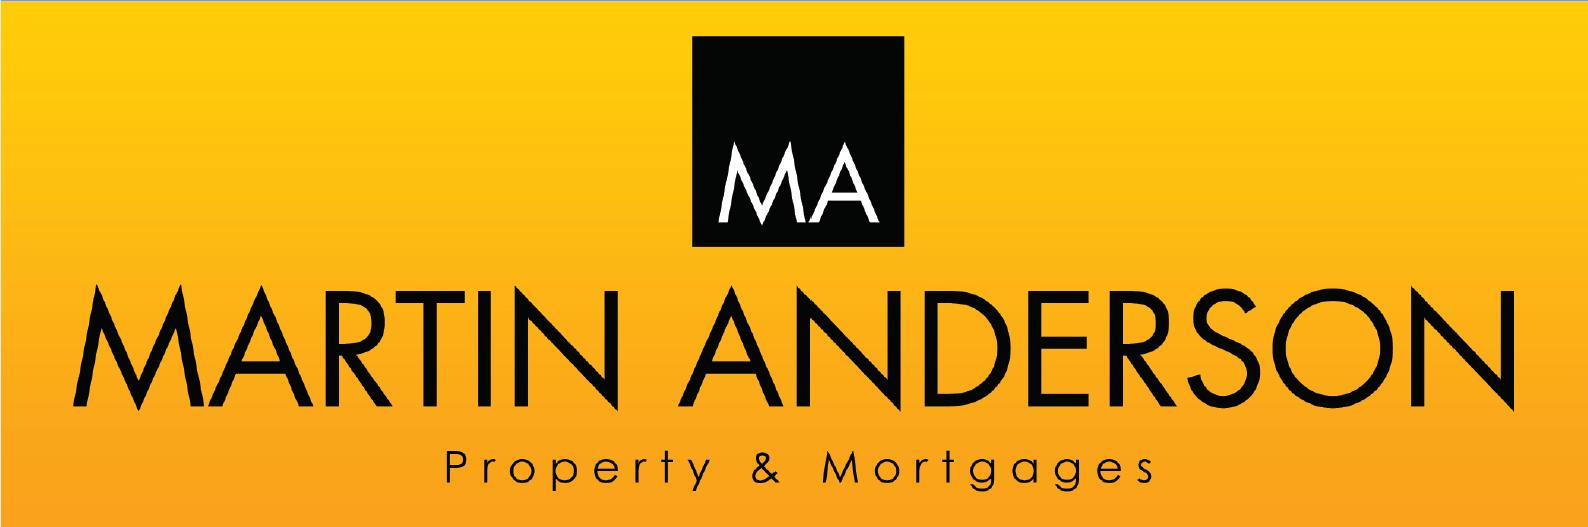 Martin Anderson Property